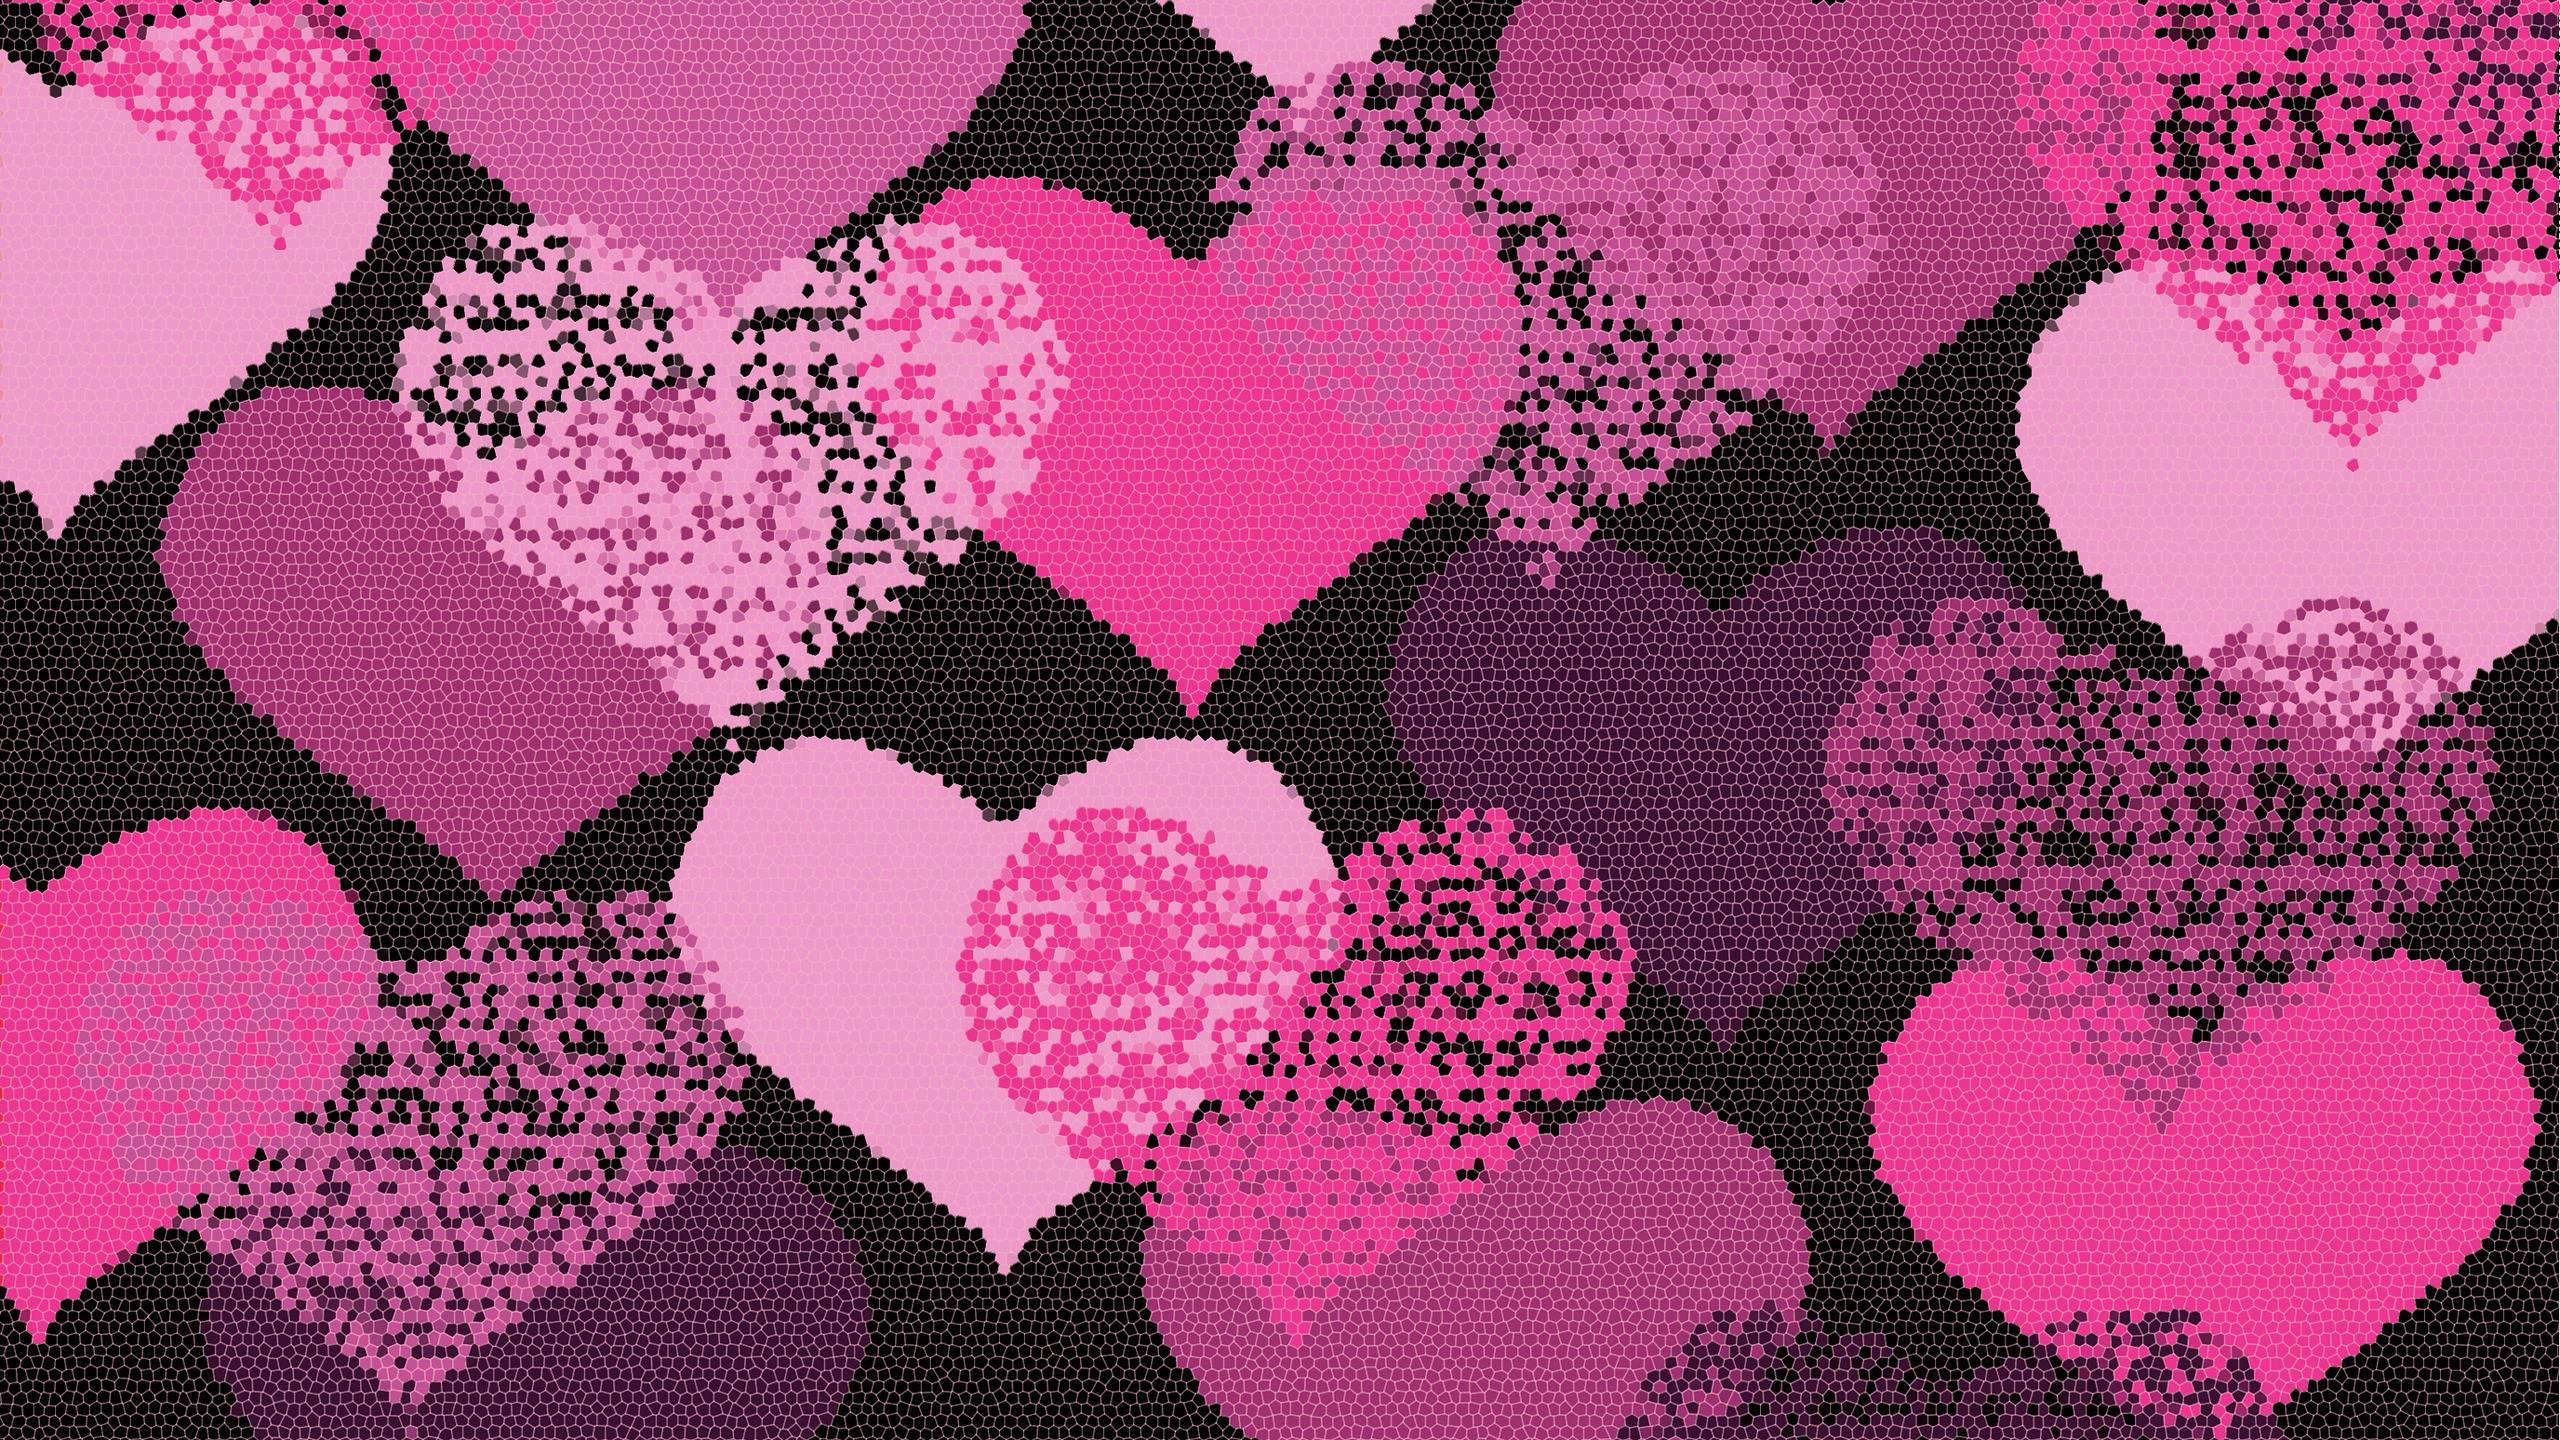 pink stars hearts wallpaper - photo #34